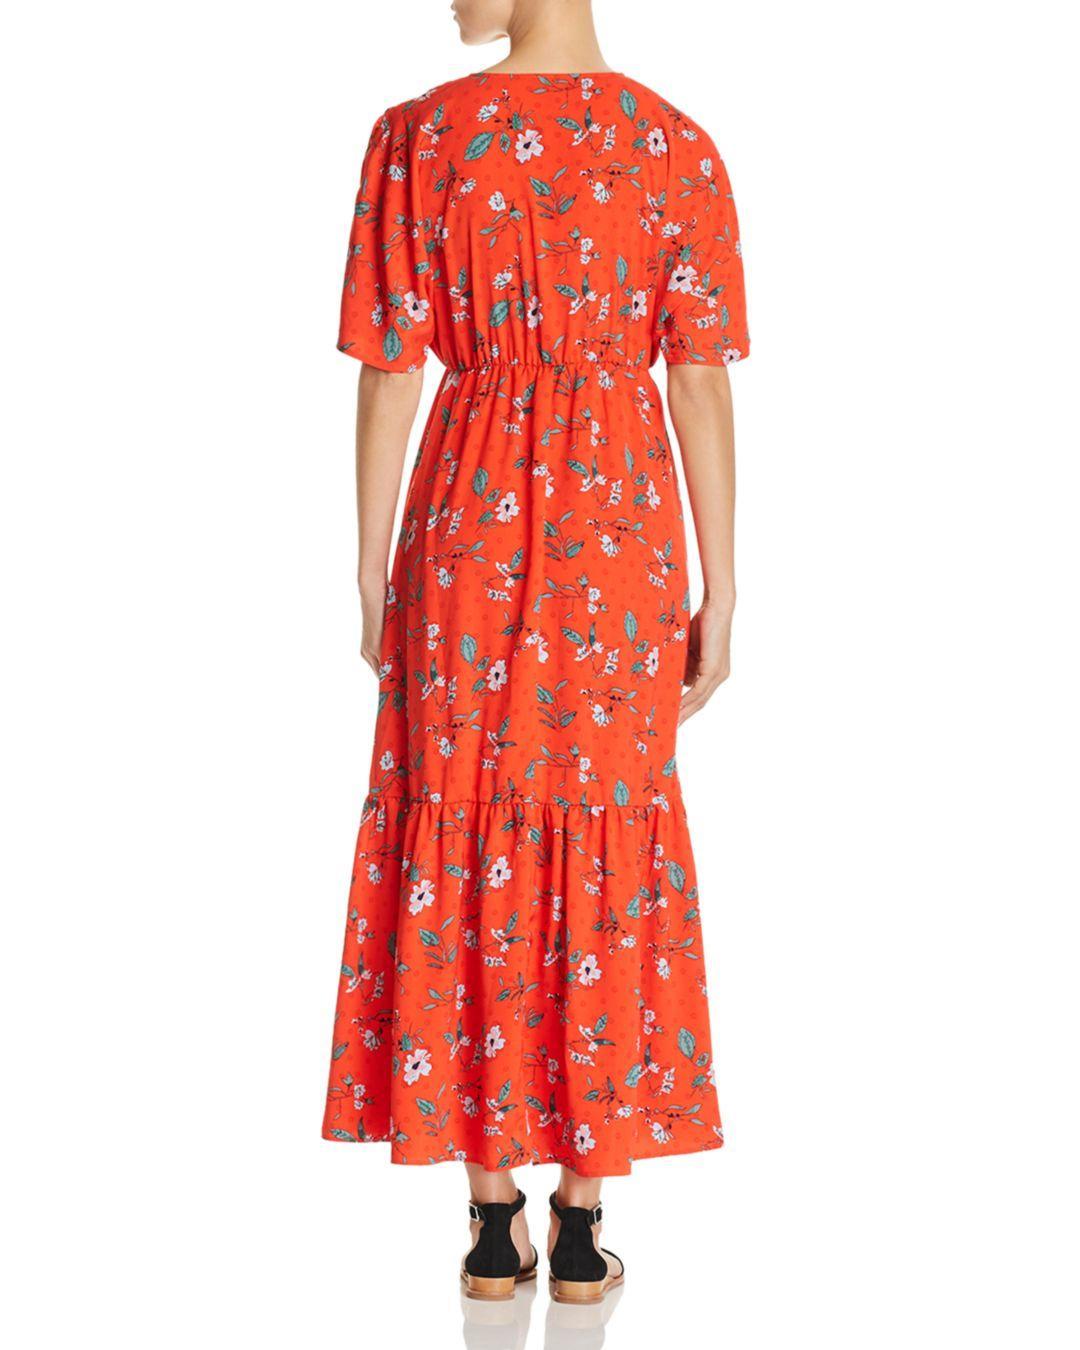 69097080700 Vero Moda Ava Floral - Print Maxi Dress in Red - Lyst